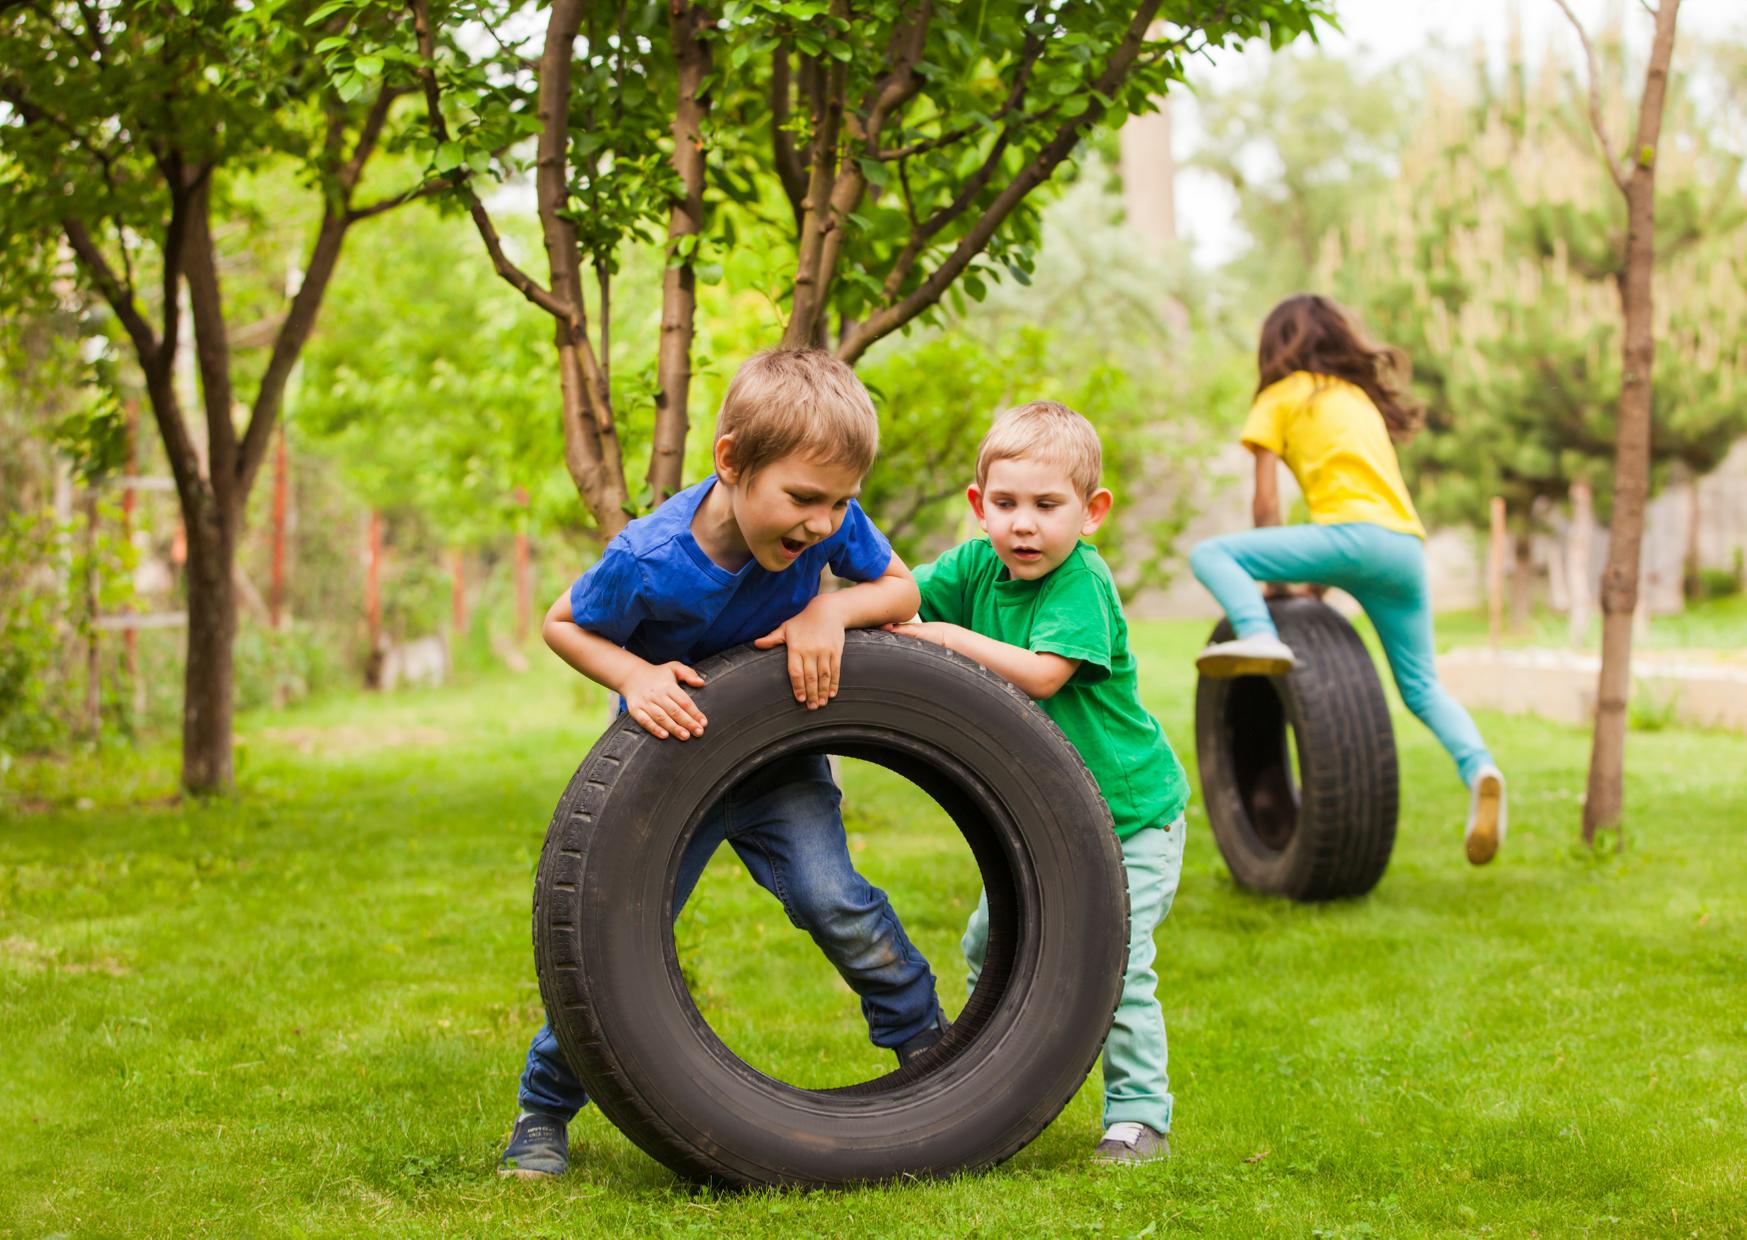 Kids having fun in backyard